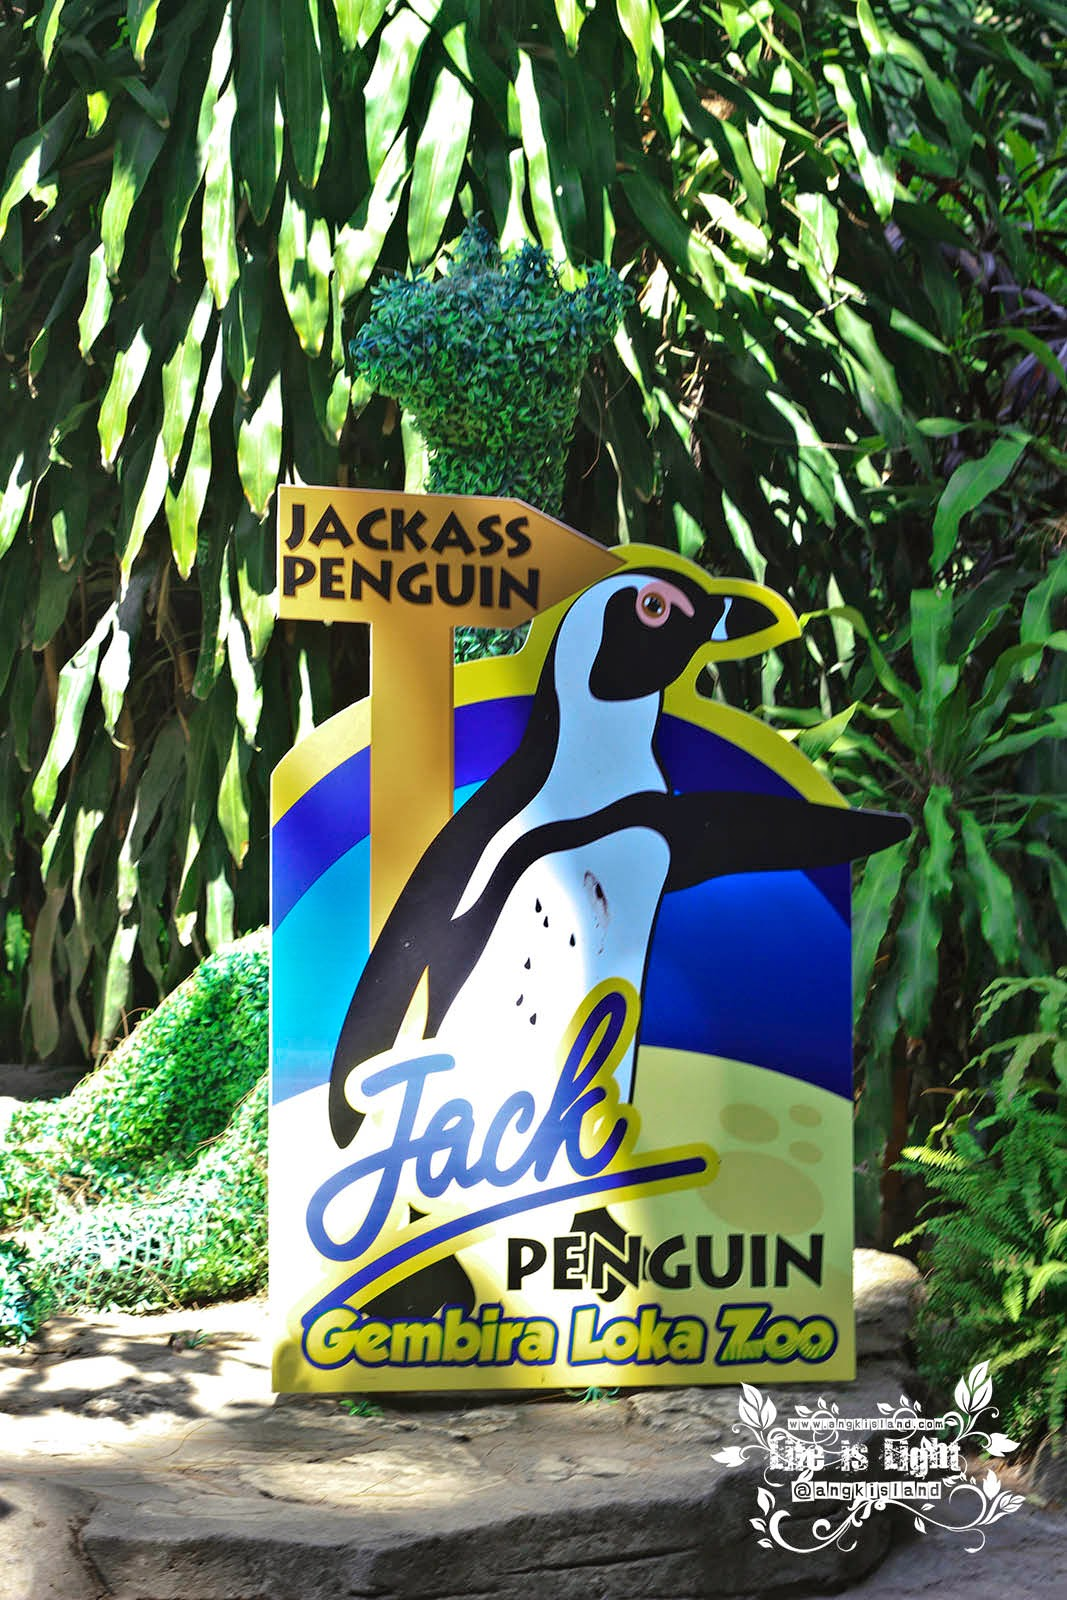 si jack ass penguin Gembiraloka